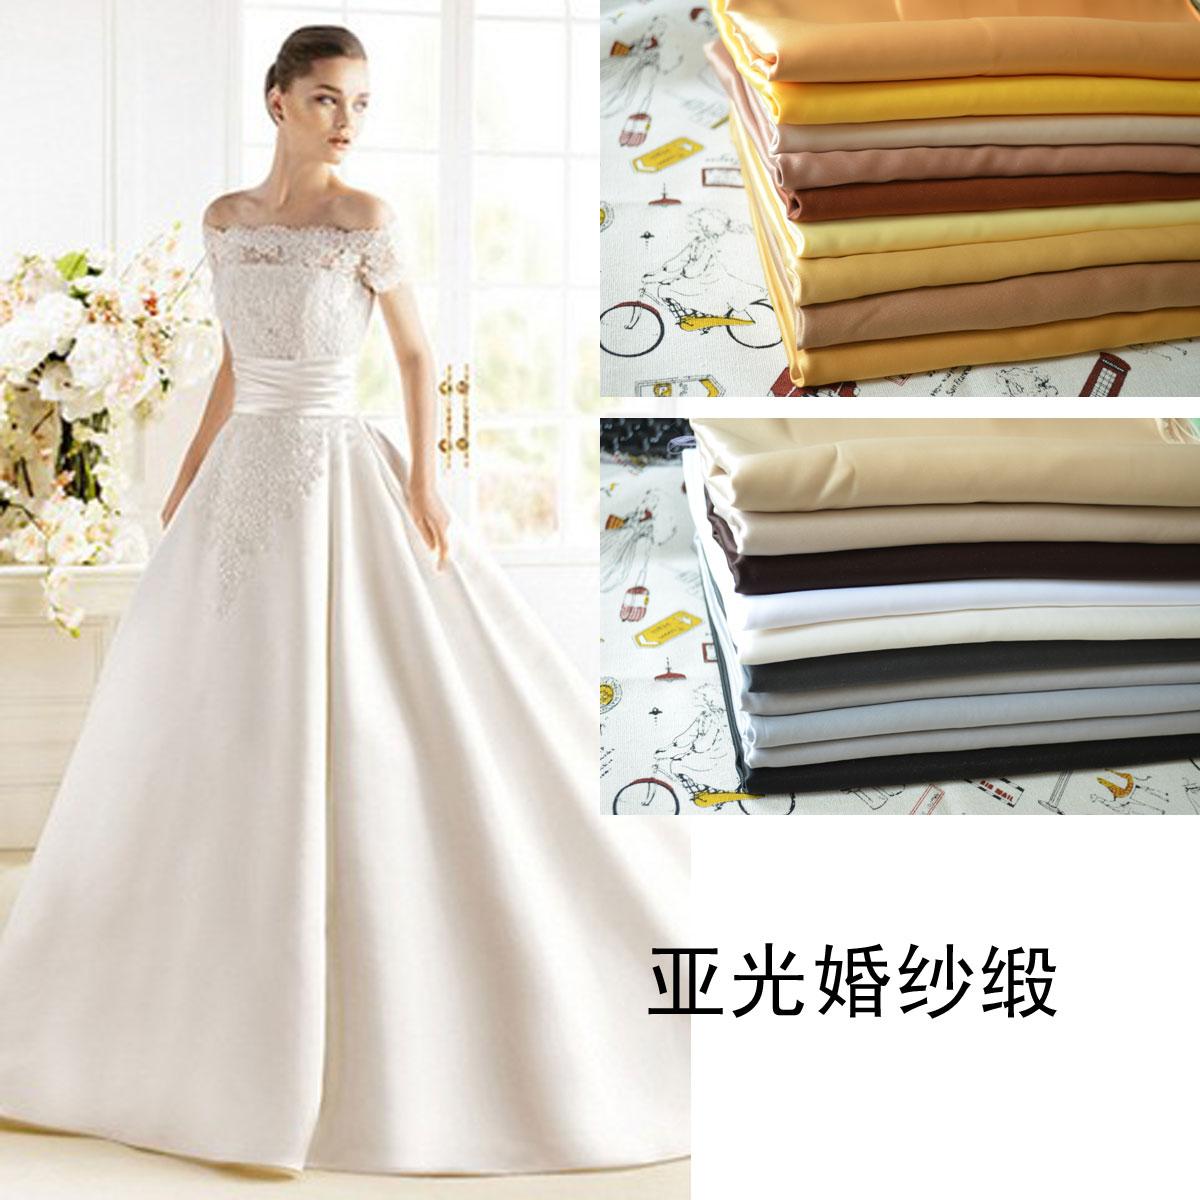 19 Colours DUCHESS BRIDAL SOFT SATIN prom wedding dress fabric material 150cm